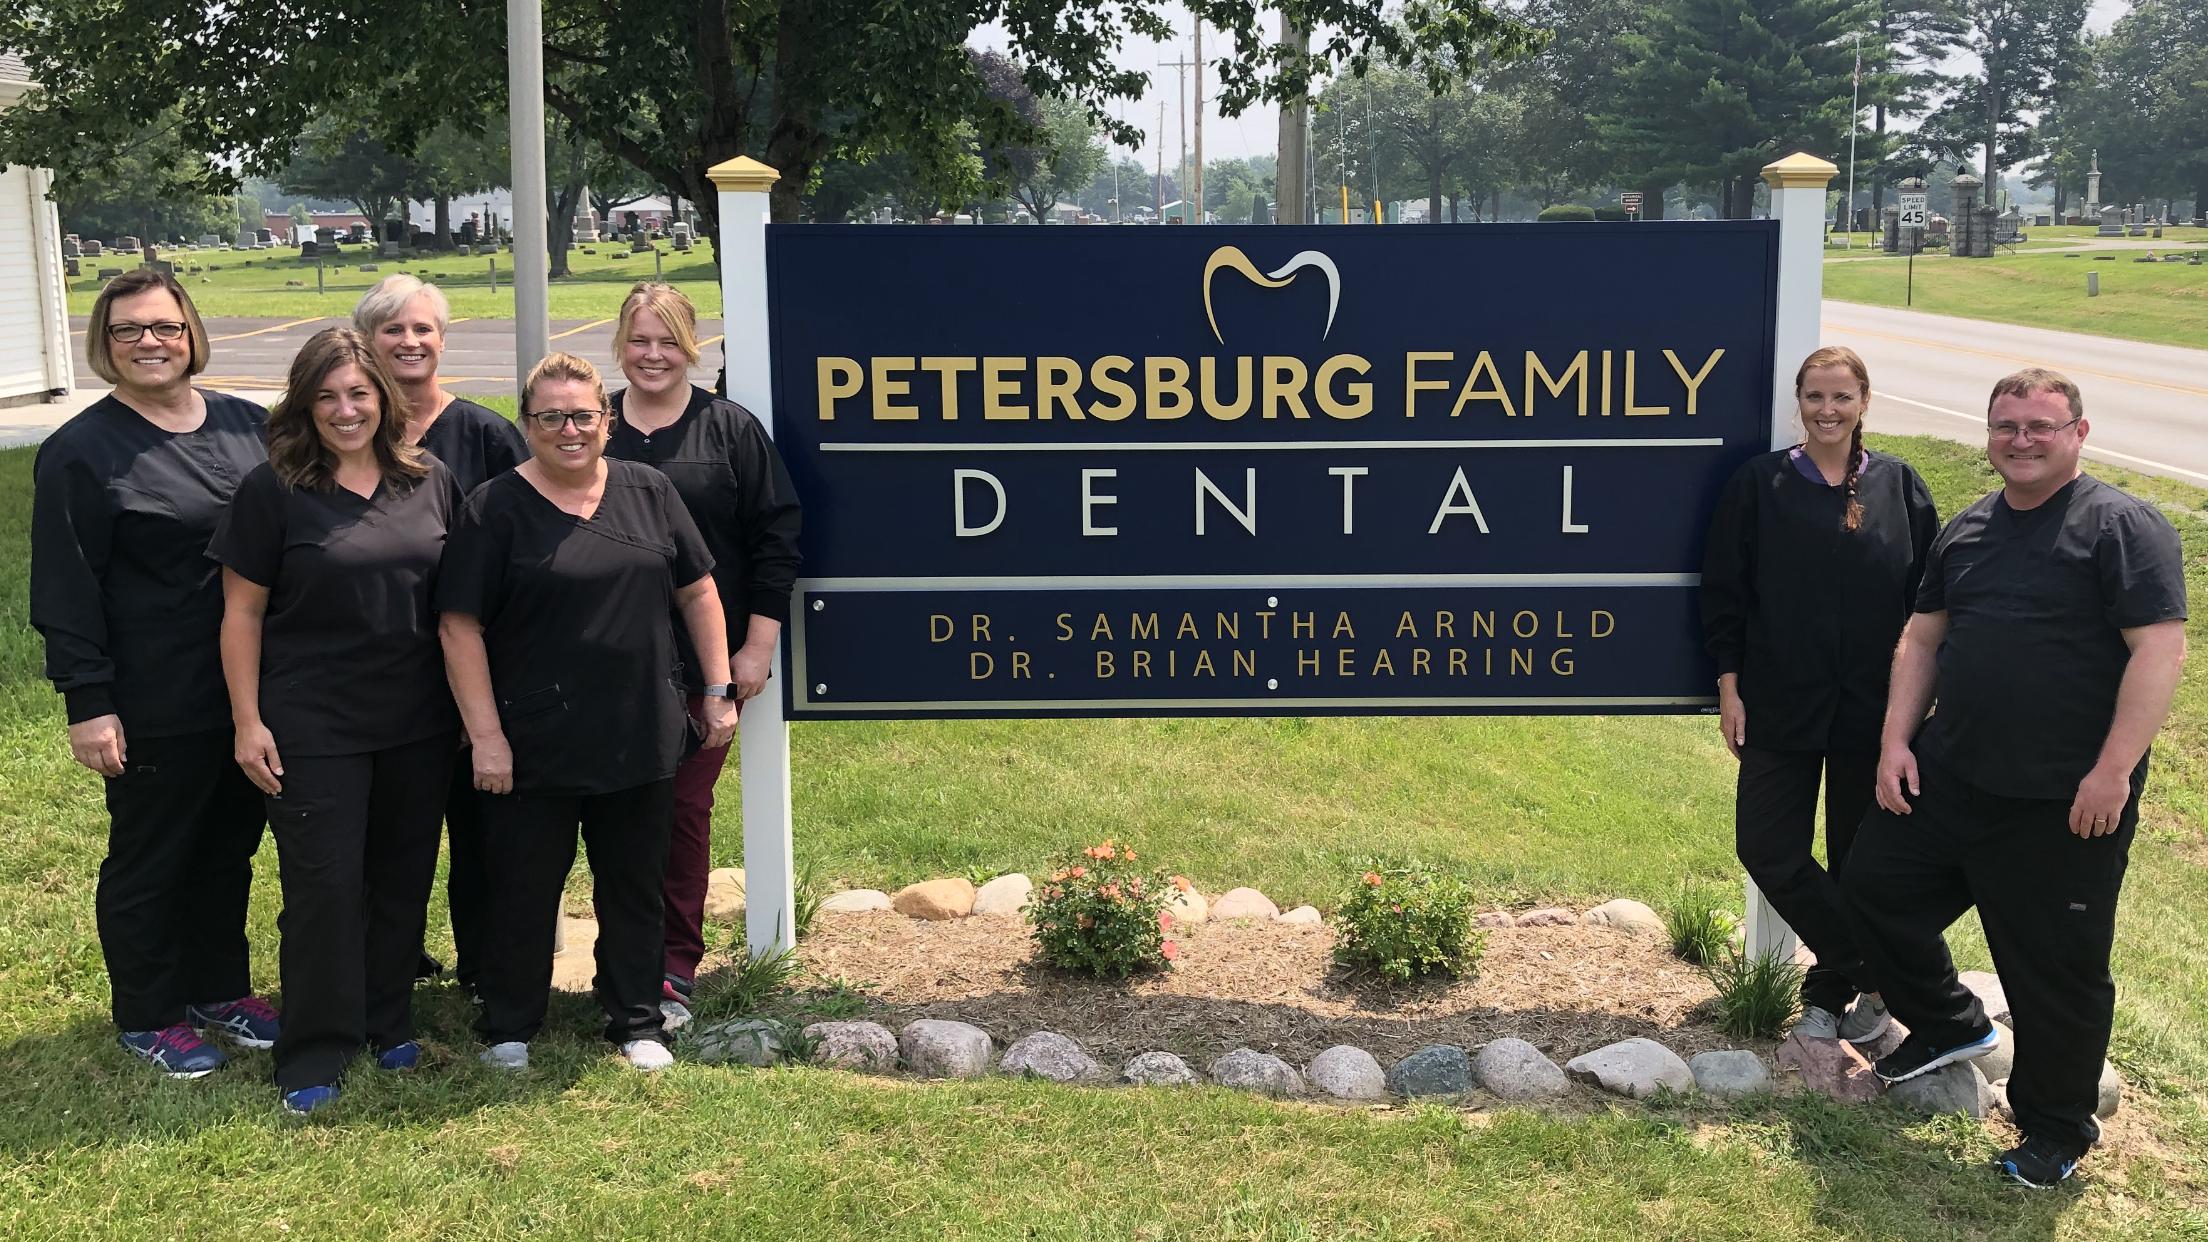 Petersburg Family Dental